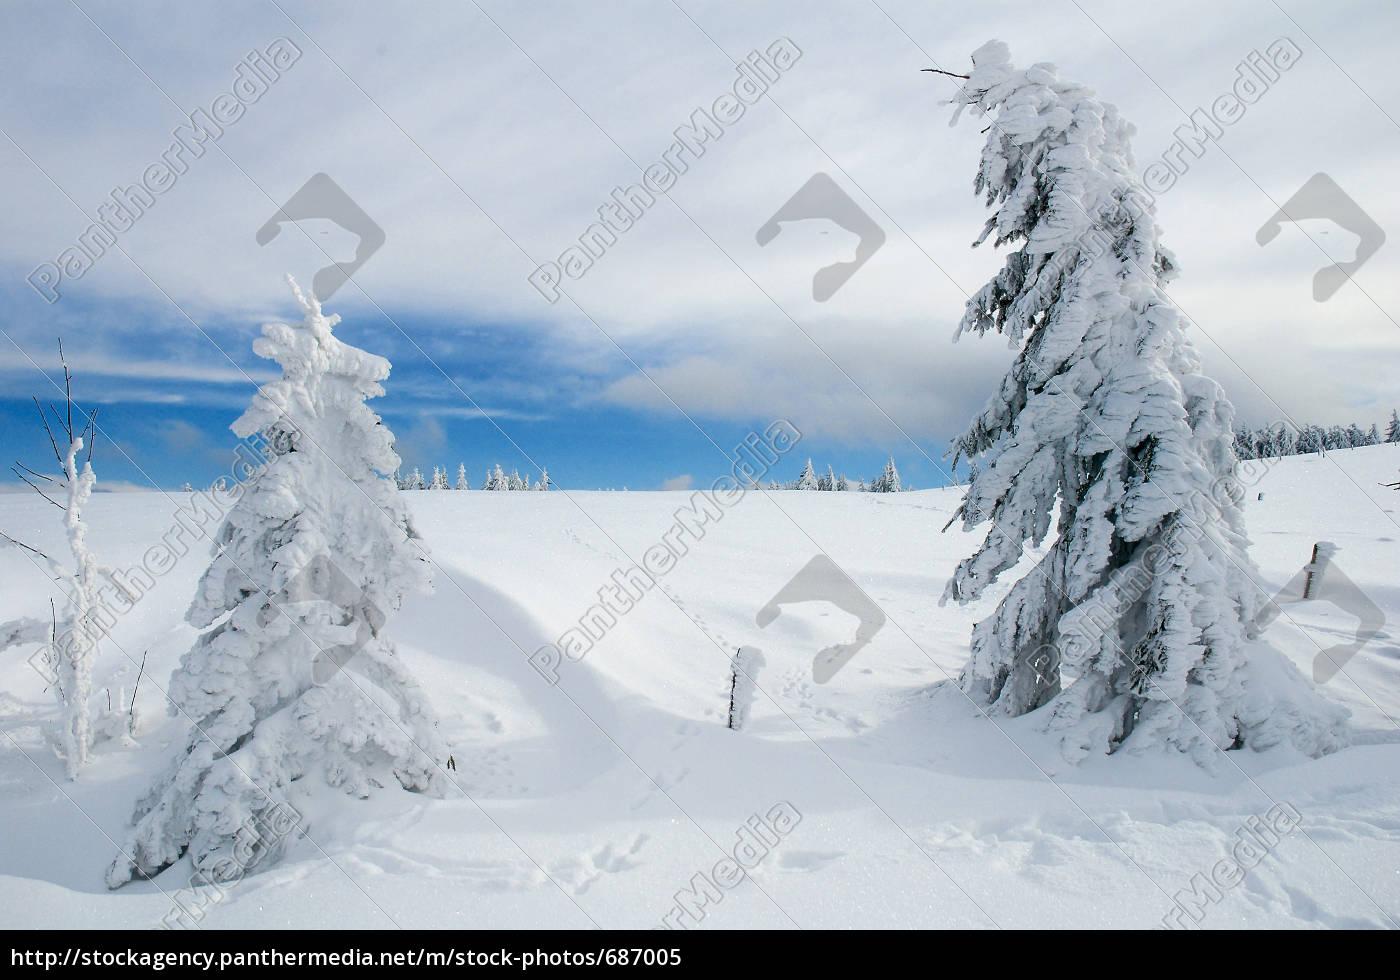 winter, landscape, 21 - 687005